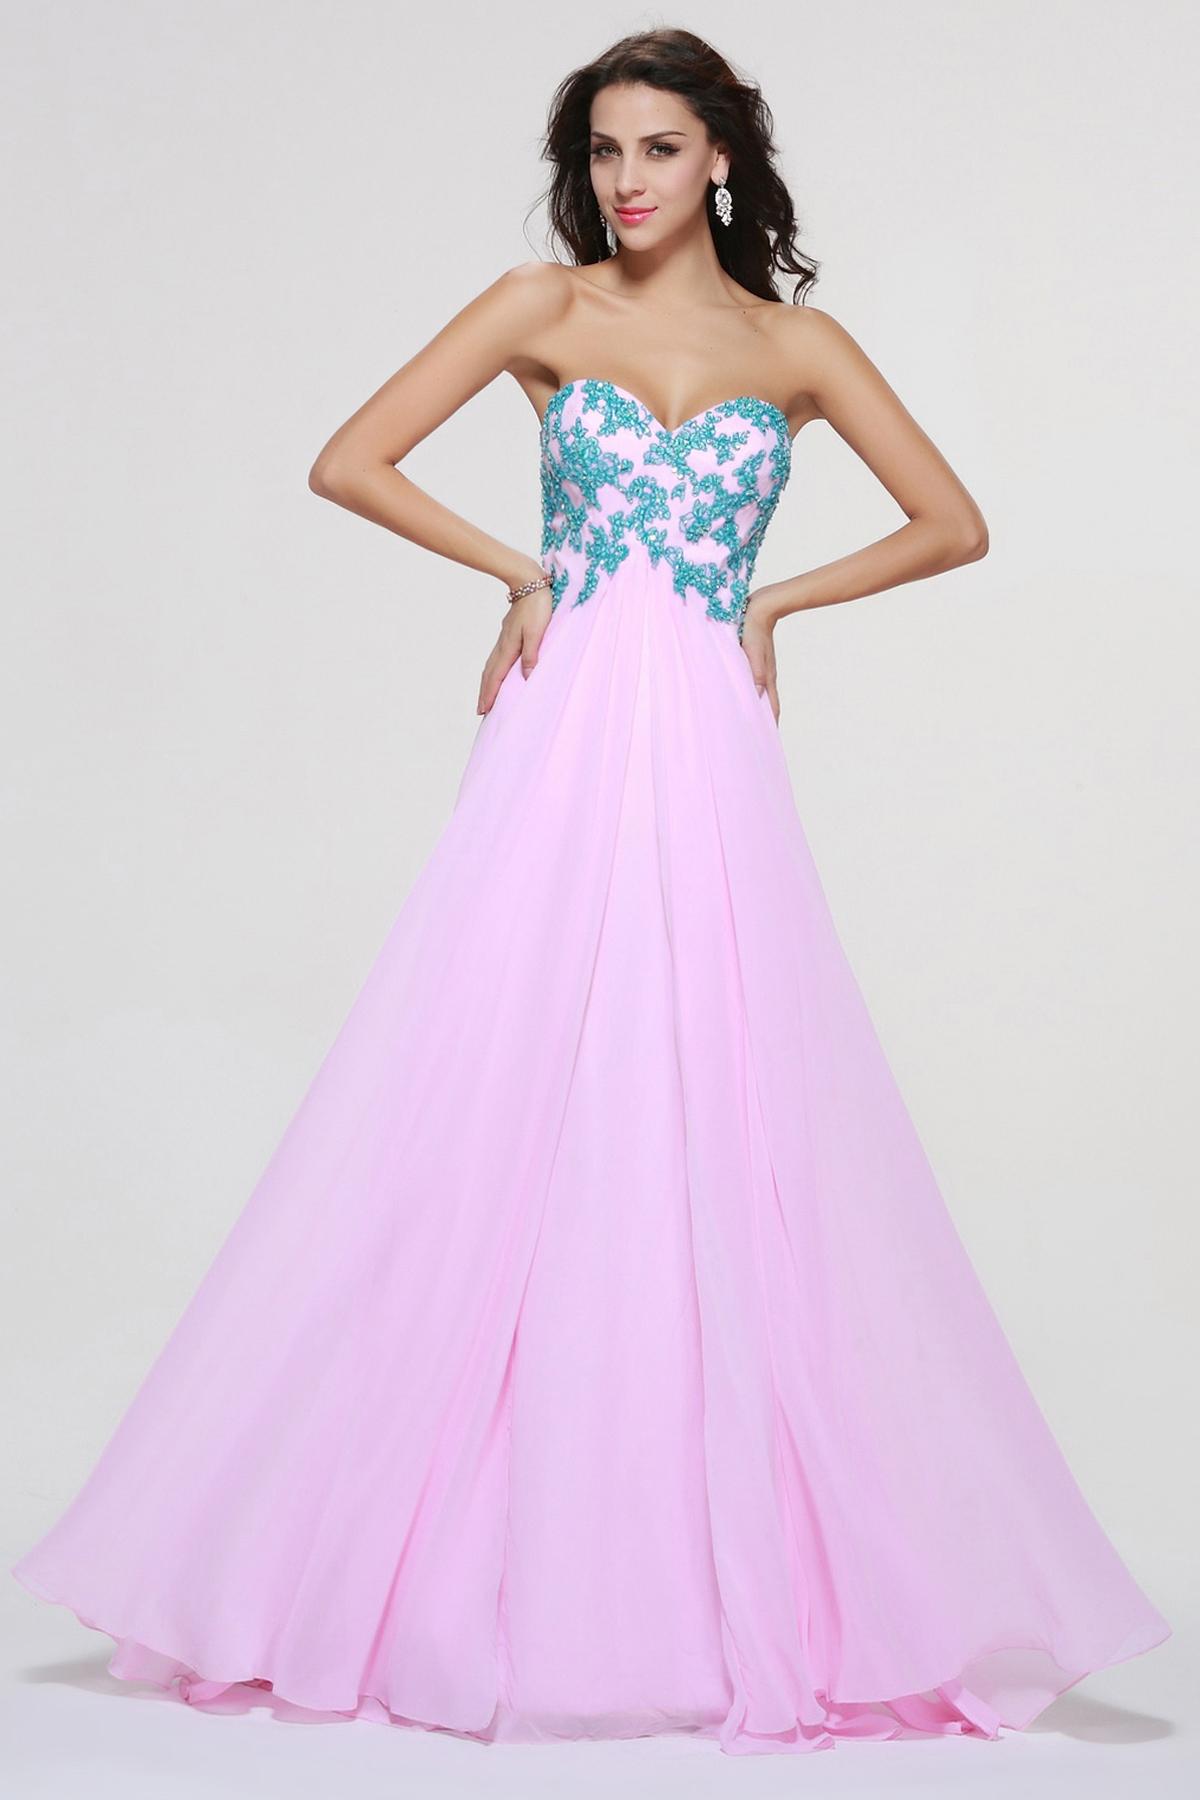 Crown Prom Dresses - Purple Graduation Dresses